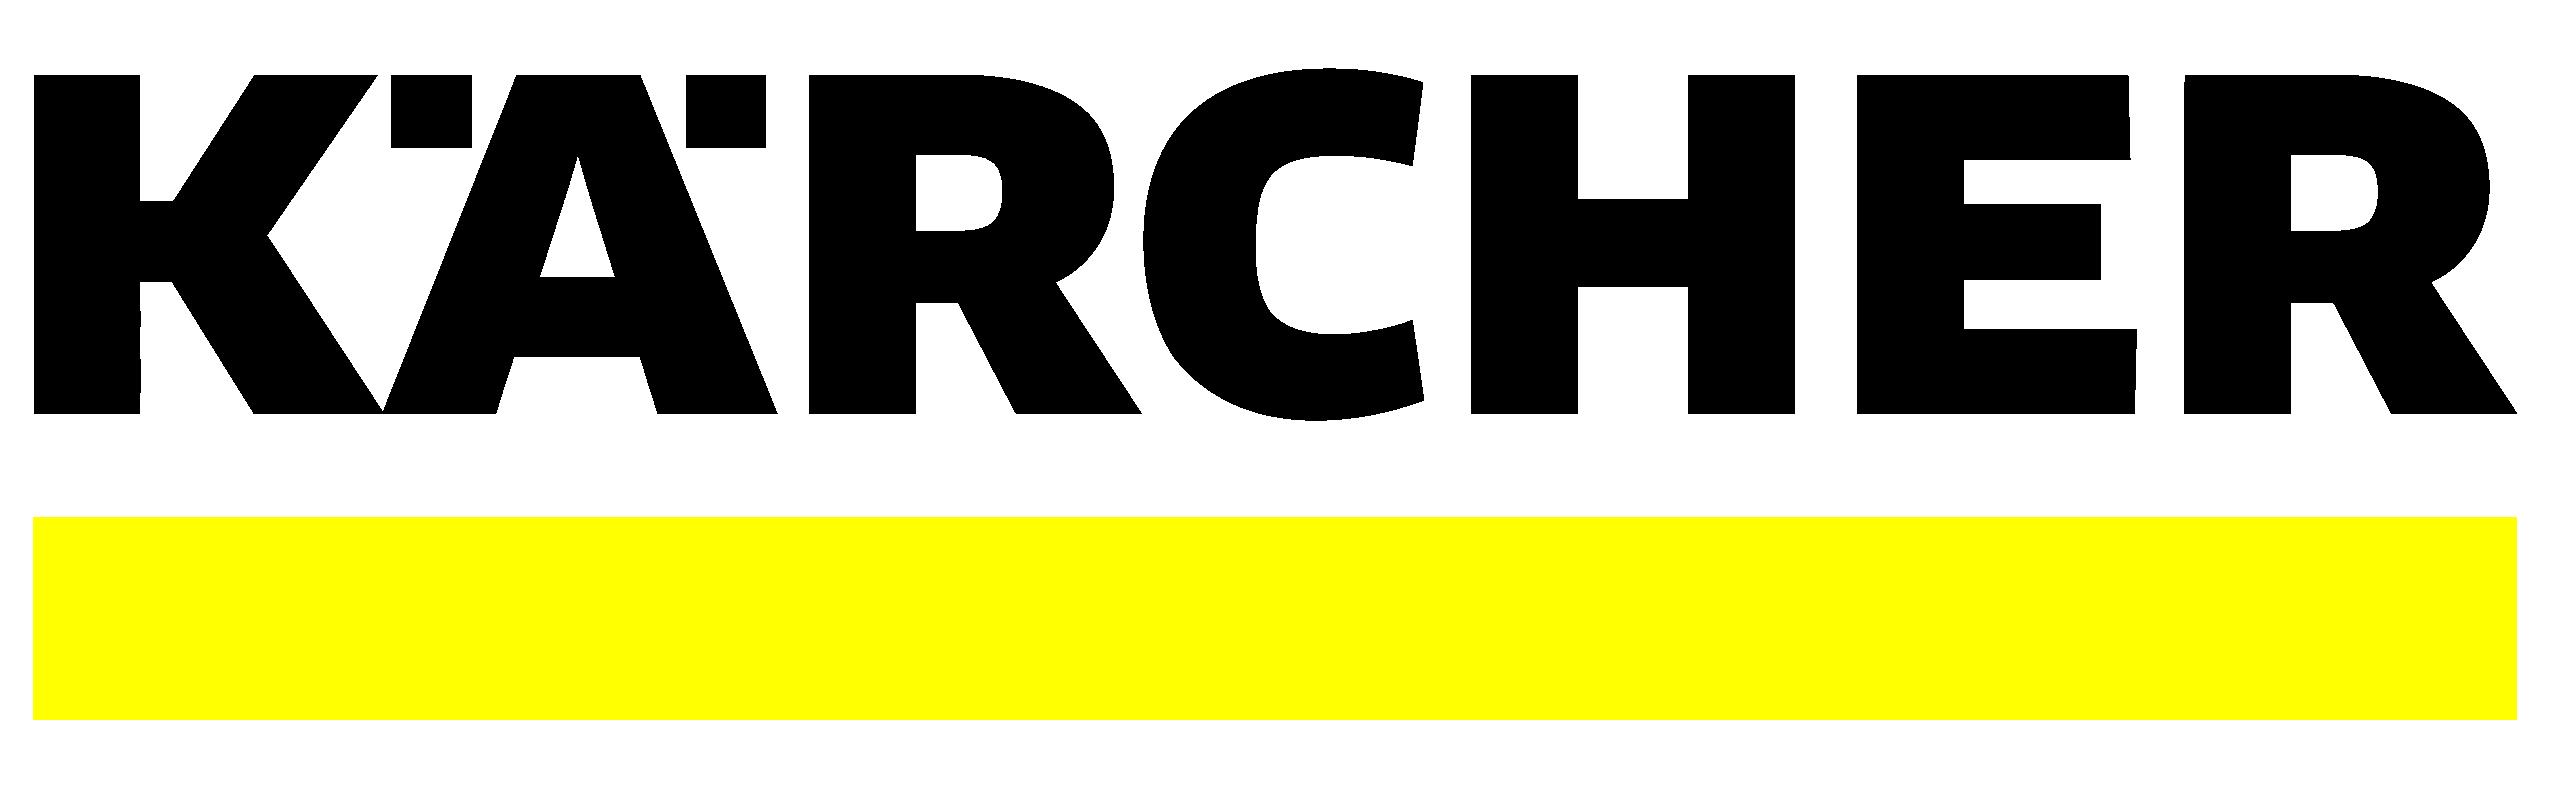 KarcherLogo_Color